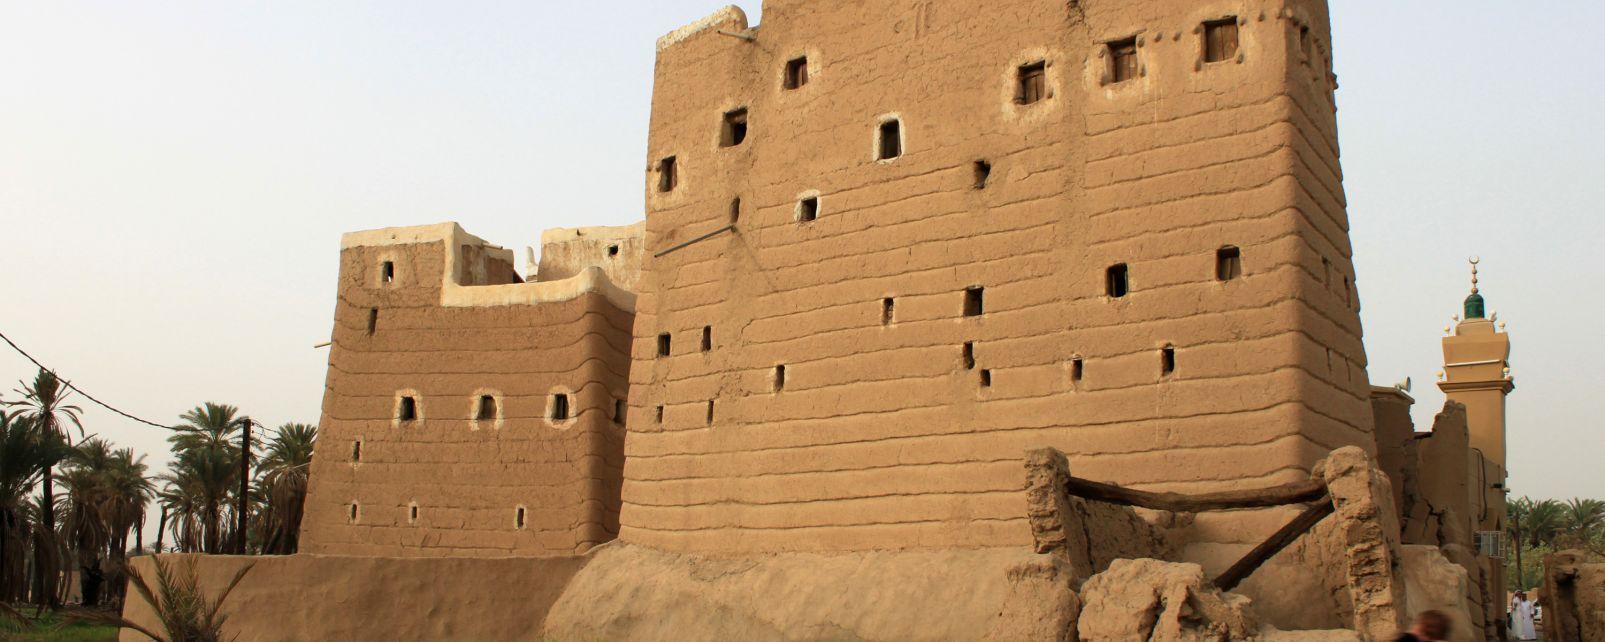 The site of Najran, Monuments, Saudi Arabia